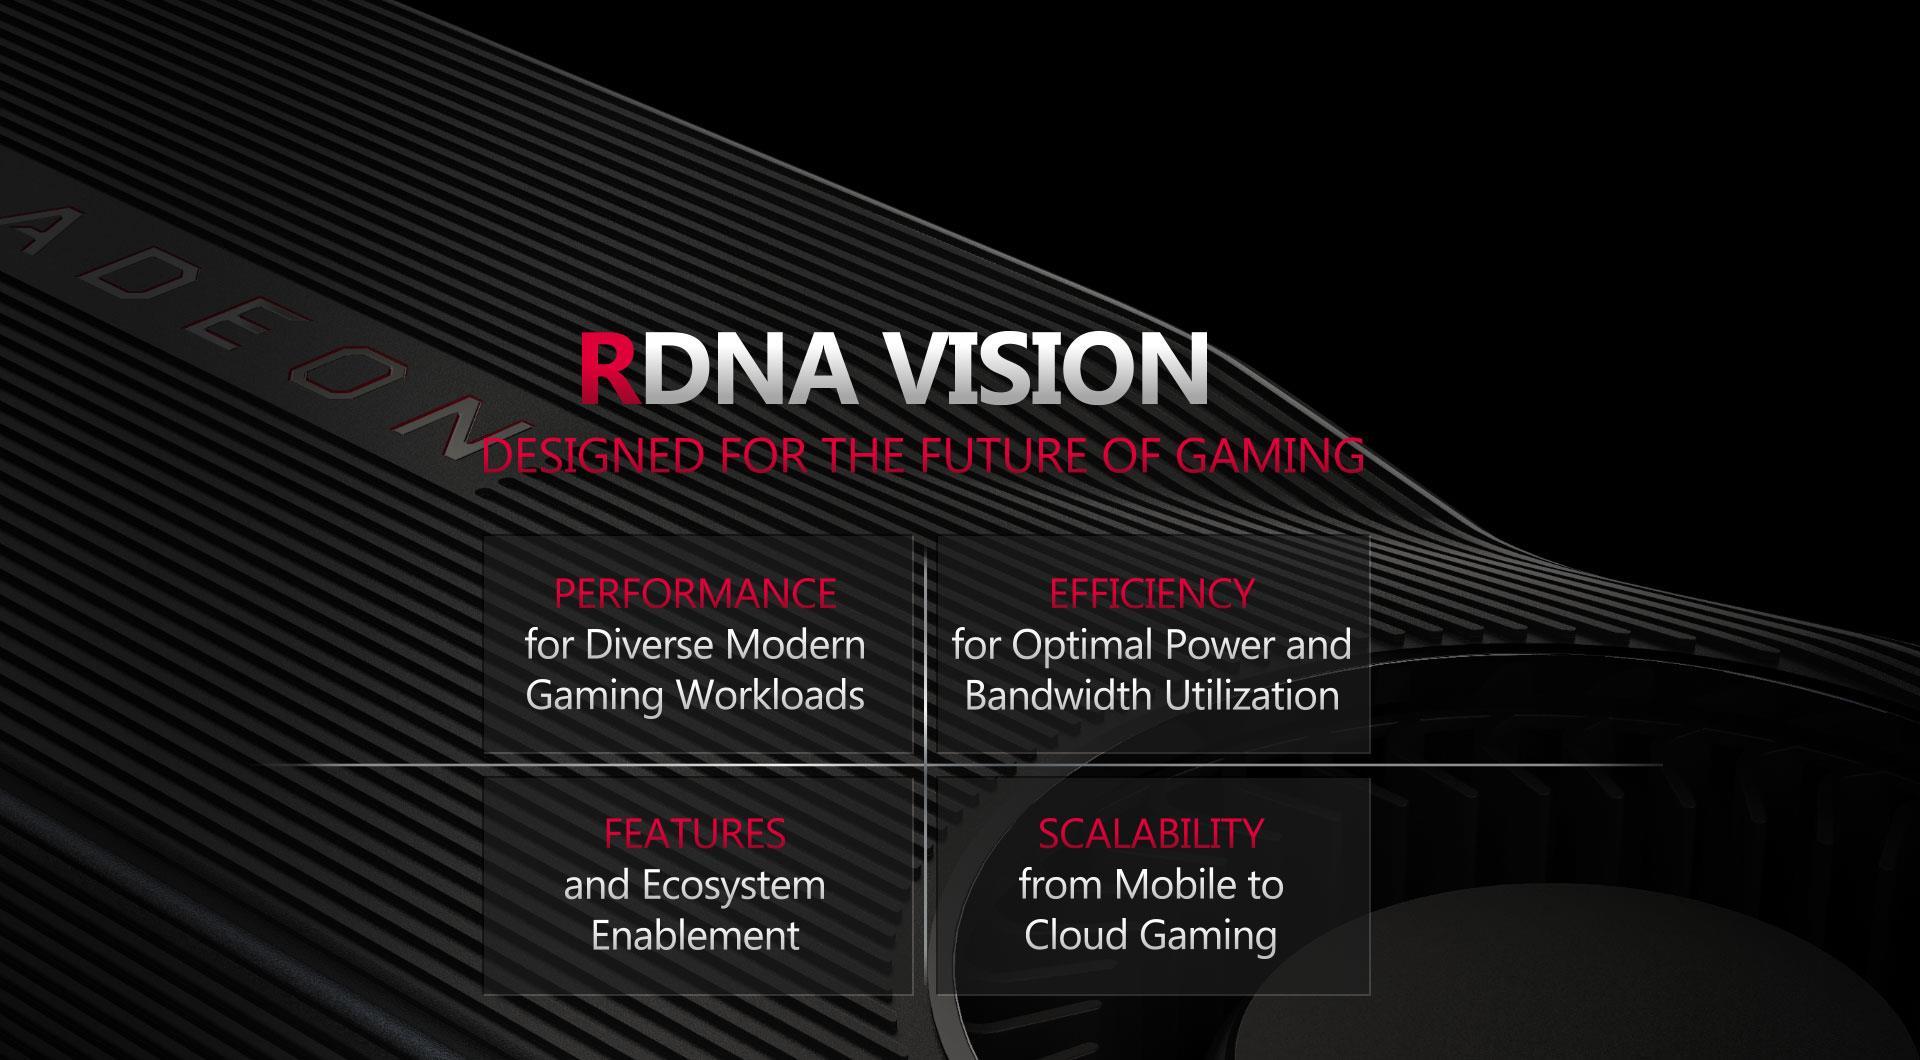 Sapphire Radeon RX 5700 XT 8G Graphics Card